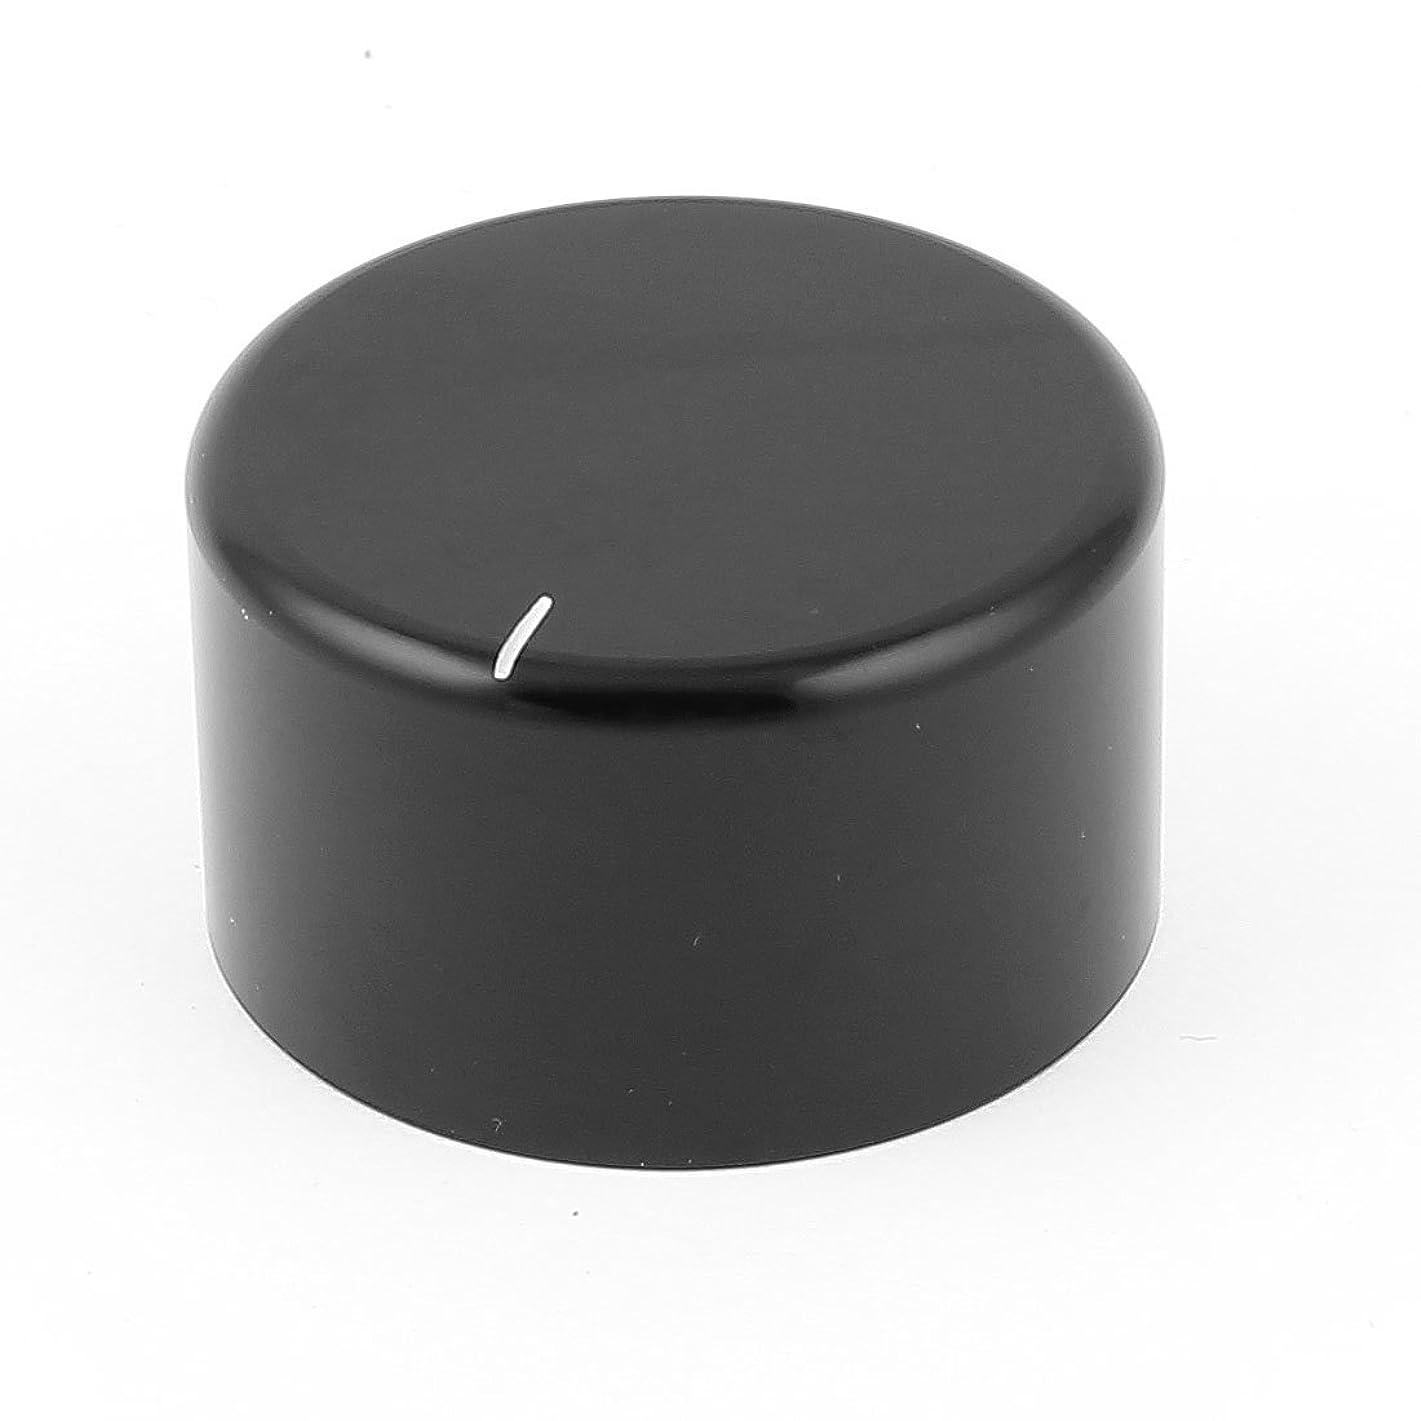 uxcell Black CNC Solid Aluminum HiFi Speaker Radio Volume Knobs 38x22mm